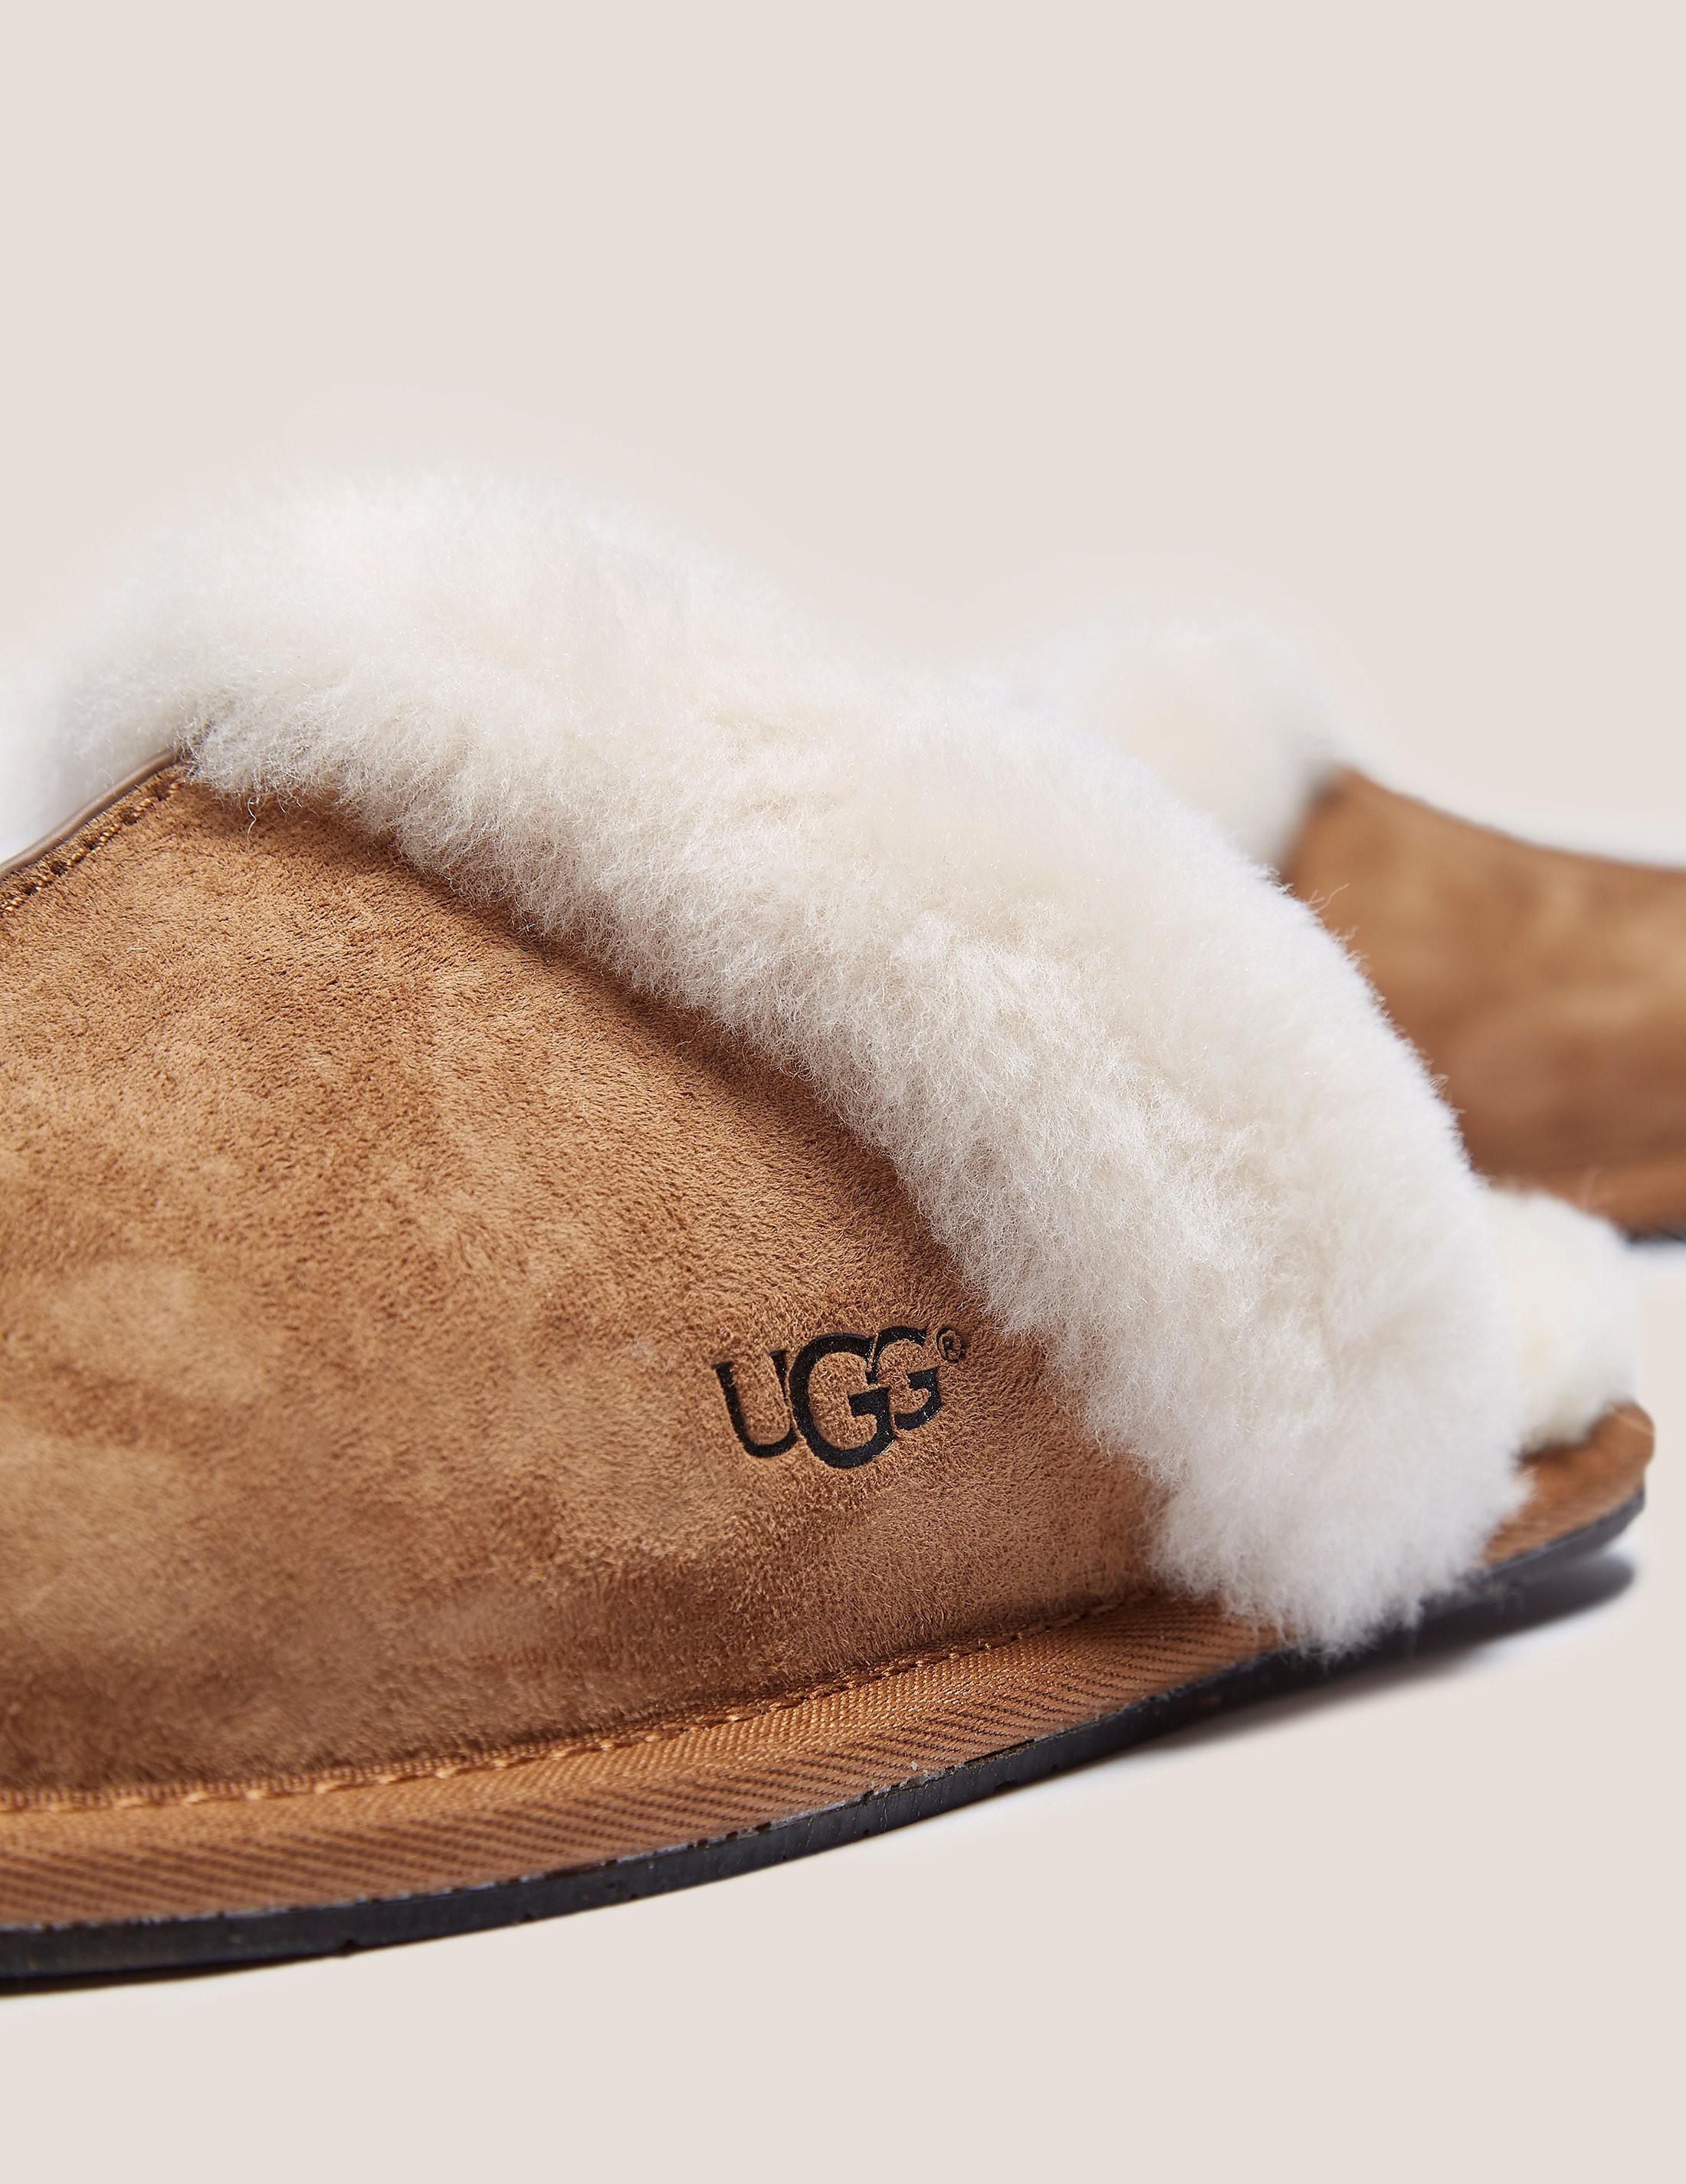 UGG Scuffette2 Slippers